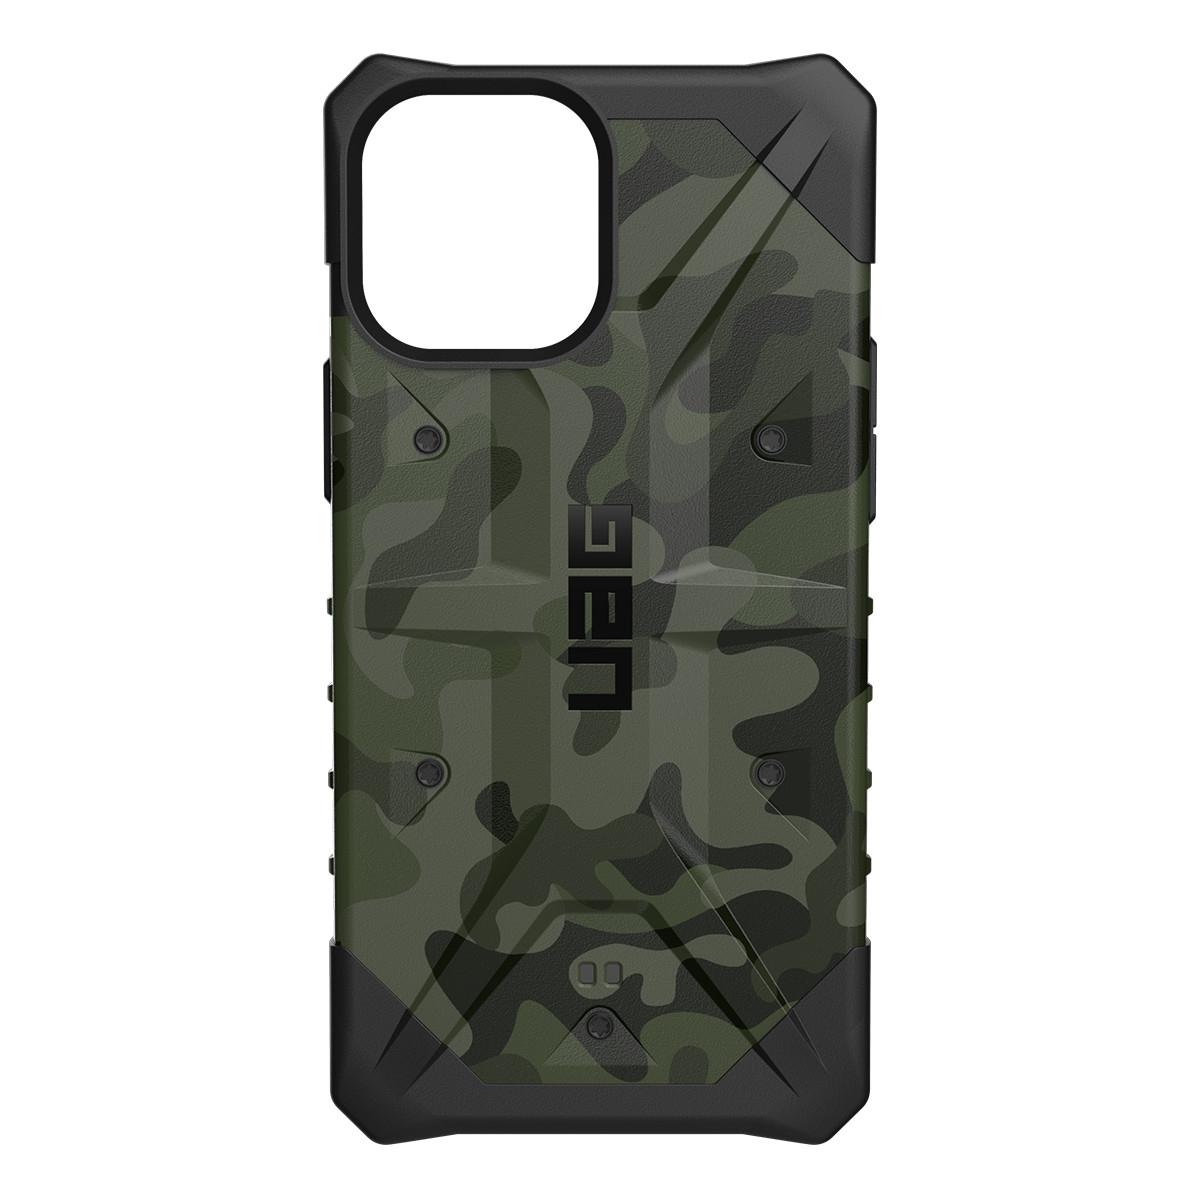 UAG Pathfinder skal, iPhone 12 Pro Max, Forest Camo